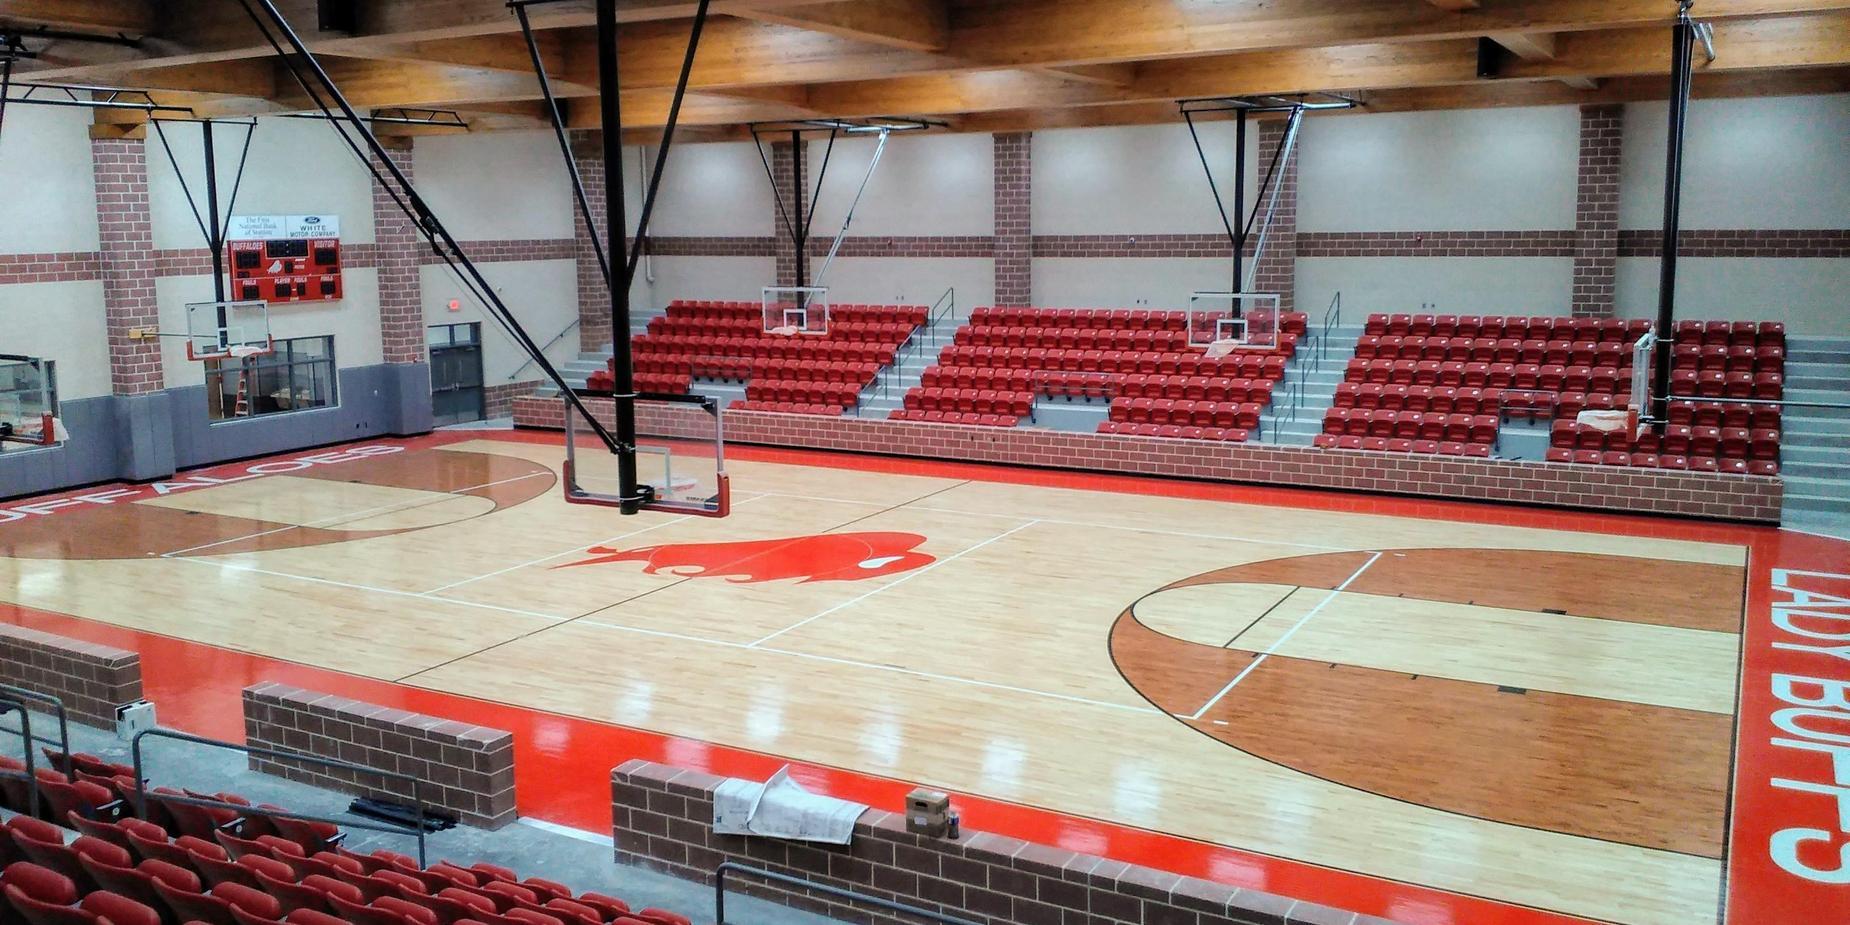 Stanton ISD basketball court